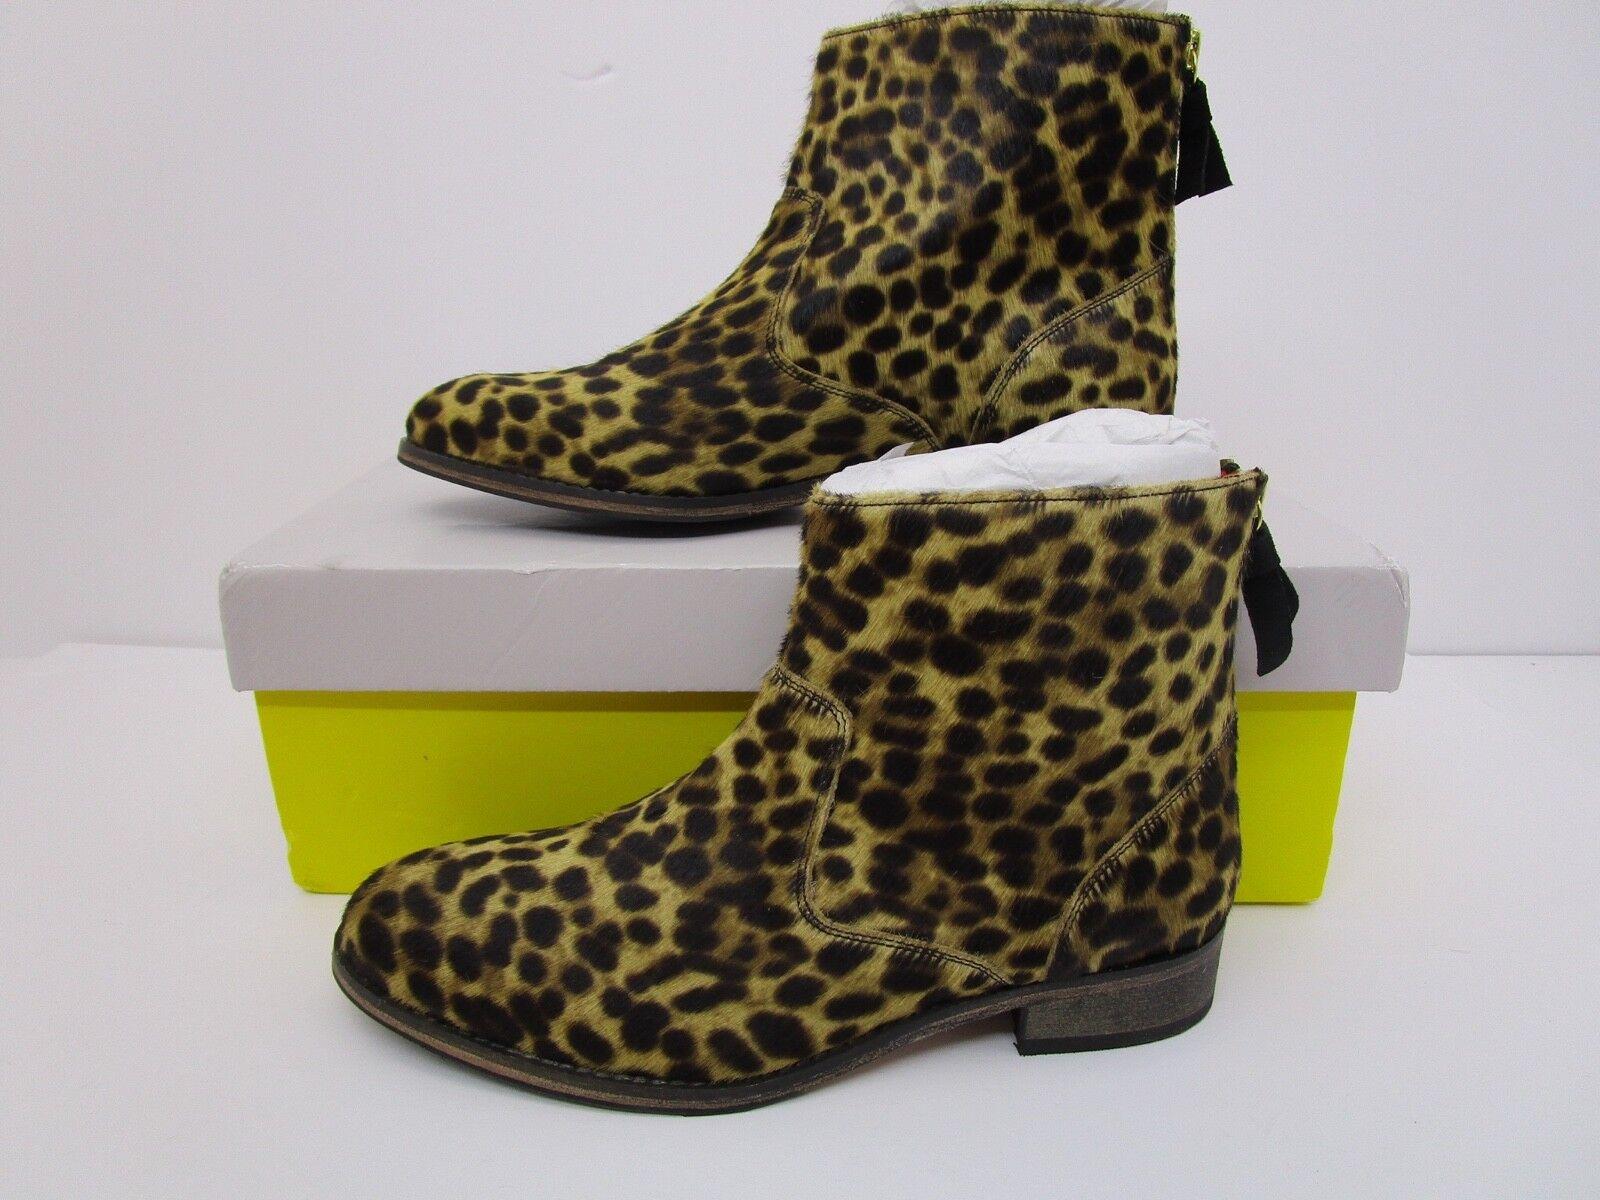 Boden Kingham Kingham Kingham Tobillo botas EU Estampado De Leopardo Talla 39 EE. UU. 8.5  en venta en línea